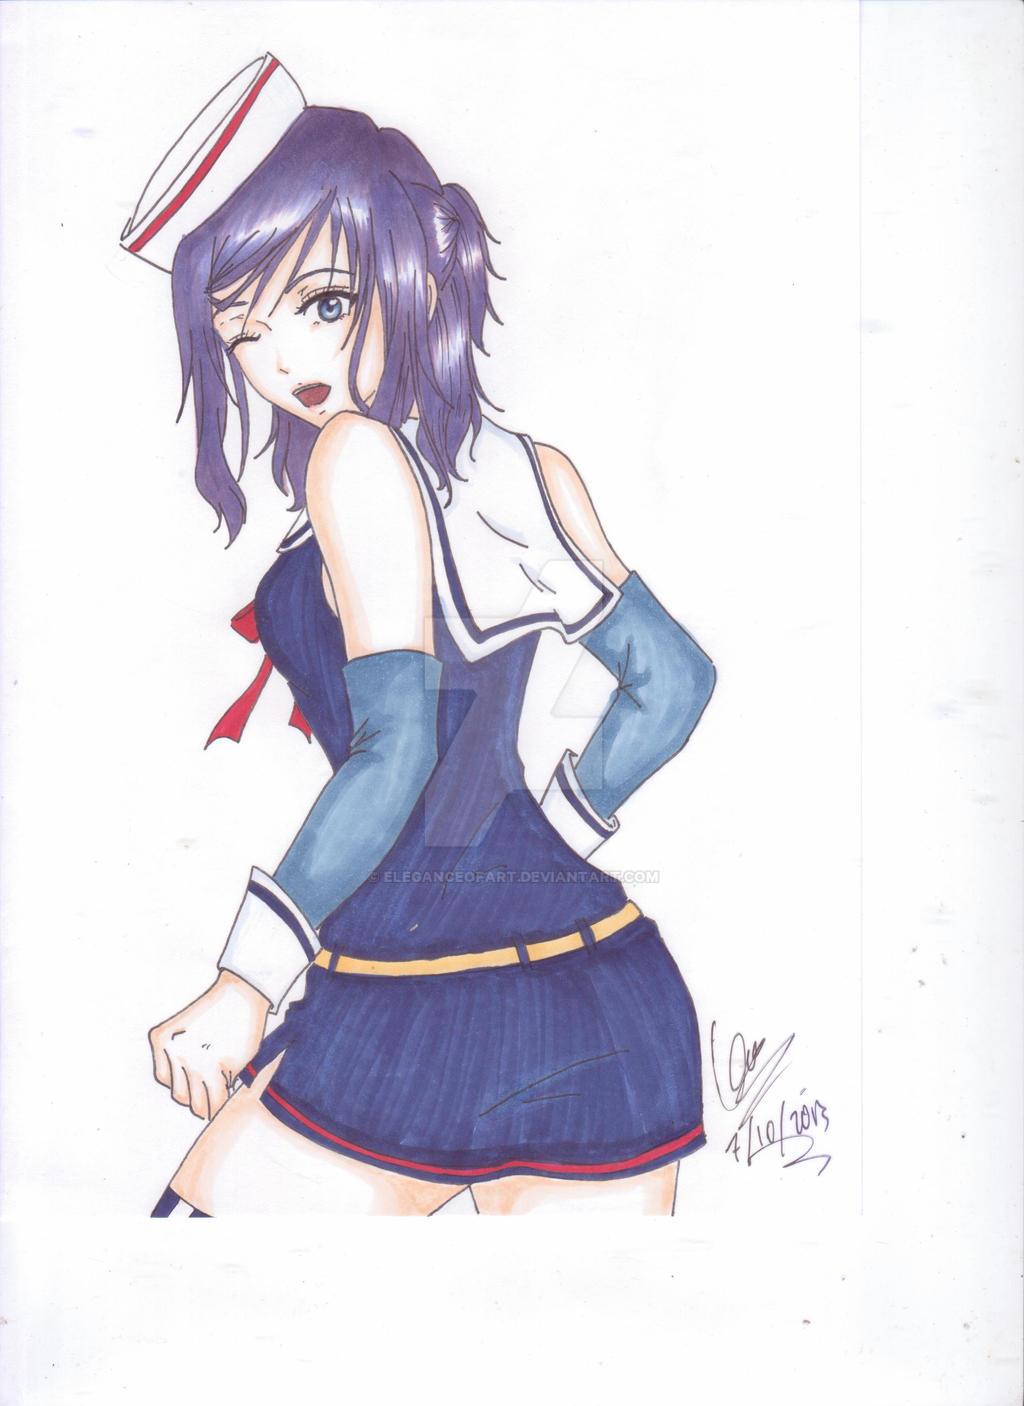 Sailor girl by EleganceOfArt